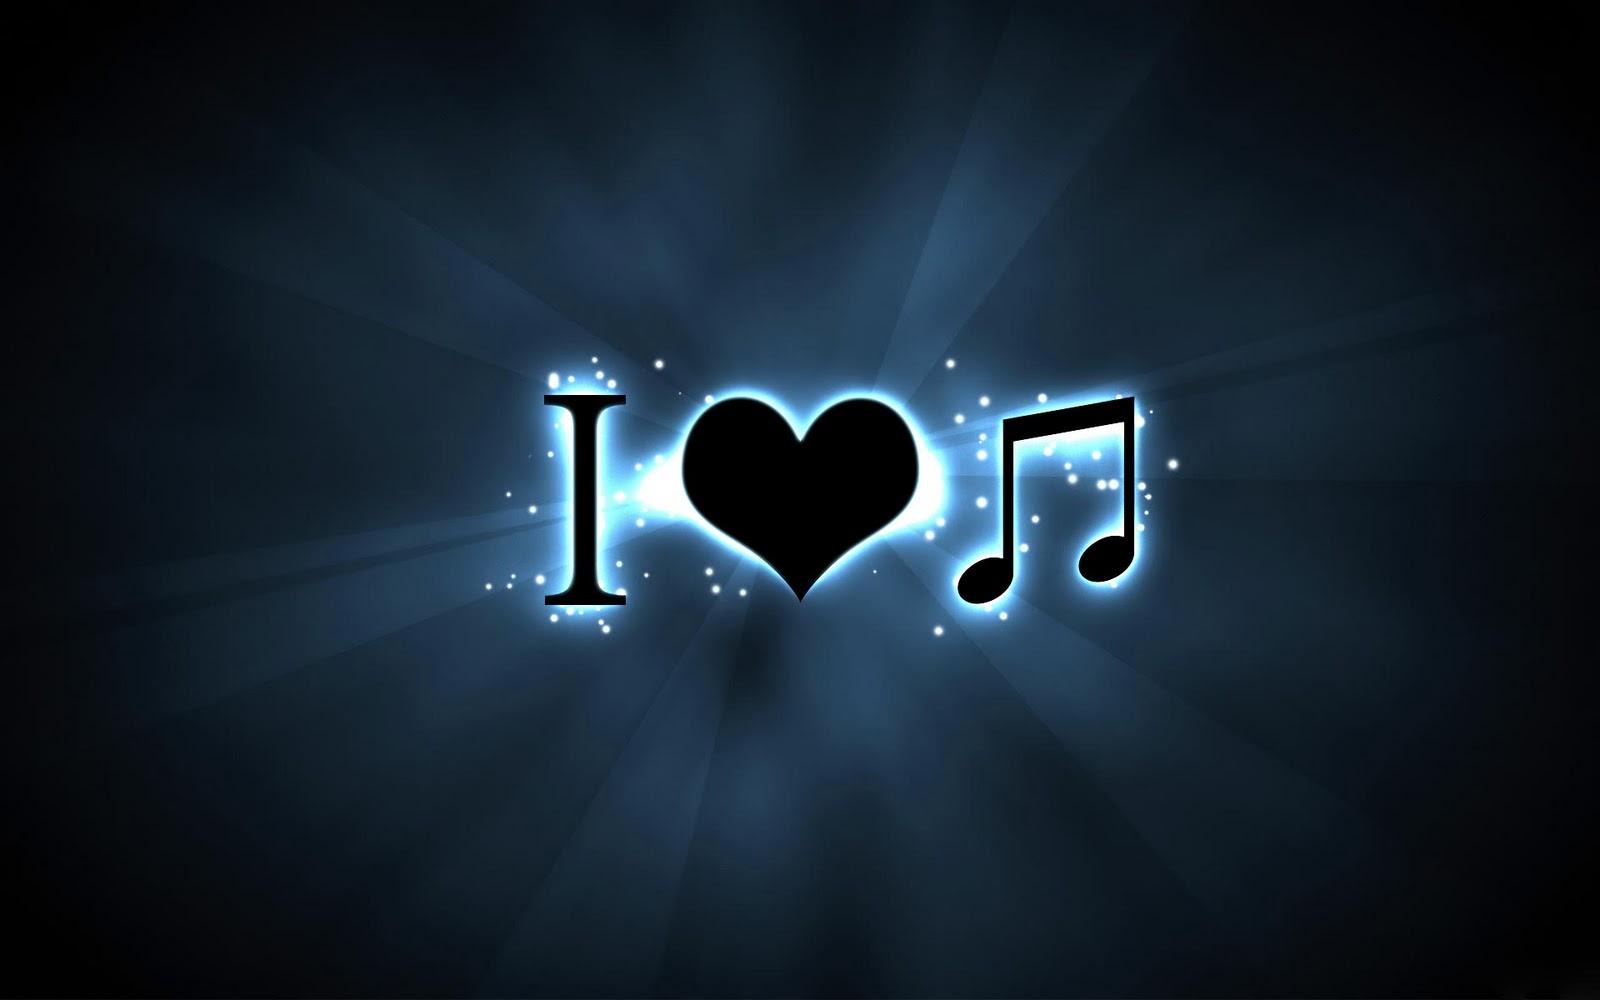 http://4.bp.blogspot.com/-atcAUOOppCY/TWSRZgfWCvI/AAAAAAAACv8/djXNs9ST6fc/s1600/I_love_music_free_windows_7_wallpaper.jpg